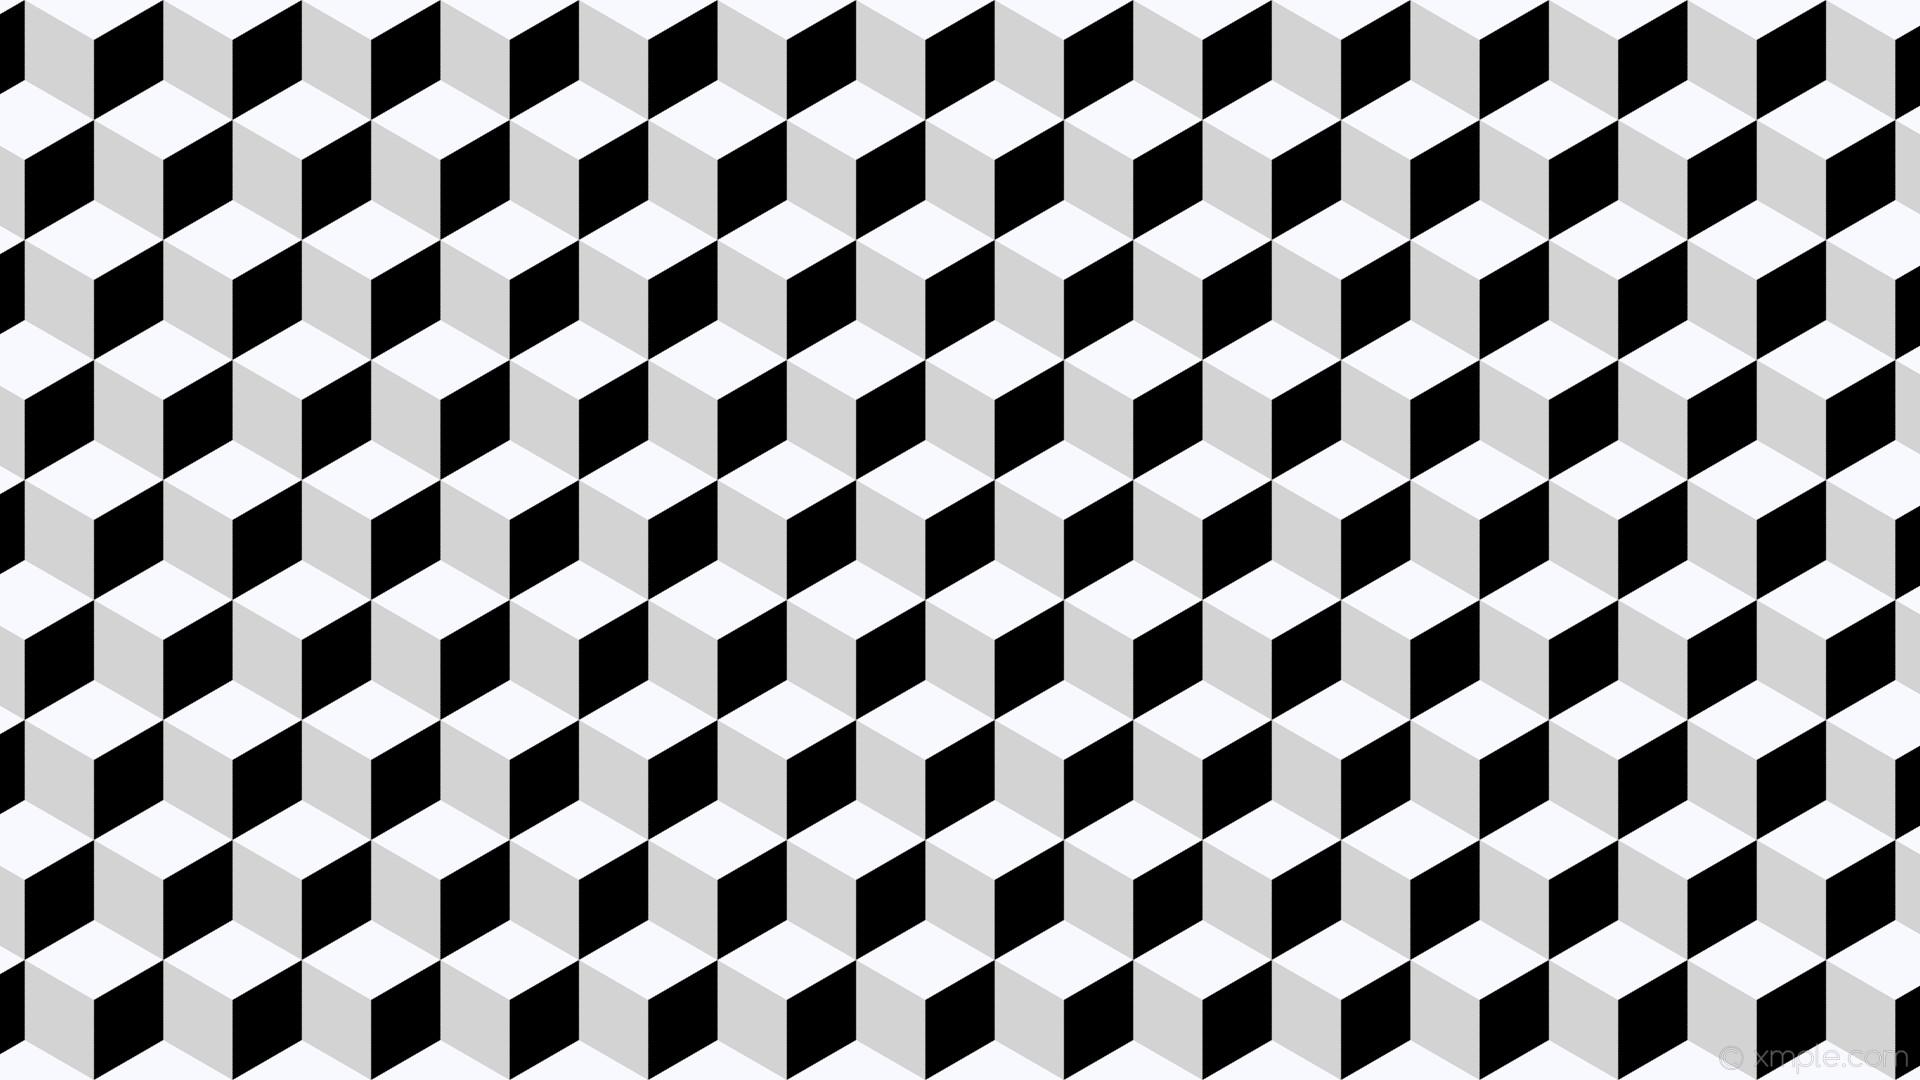 wallpaper white 3d cubes grey black ghost white light gray #000000 #f8f8ff  #d3d3d3